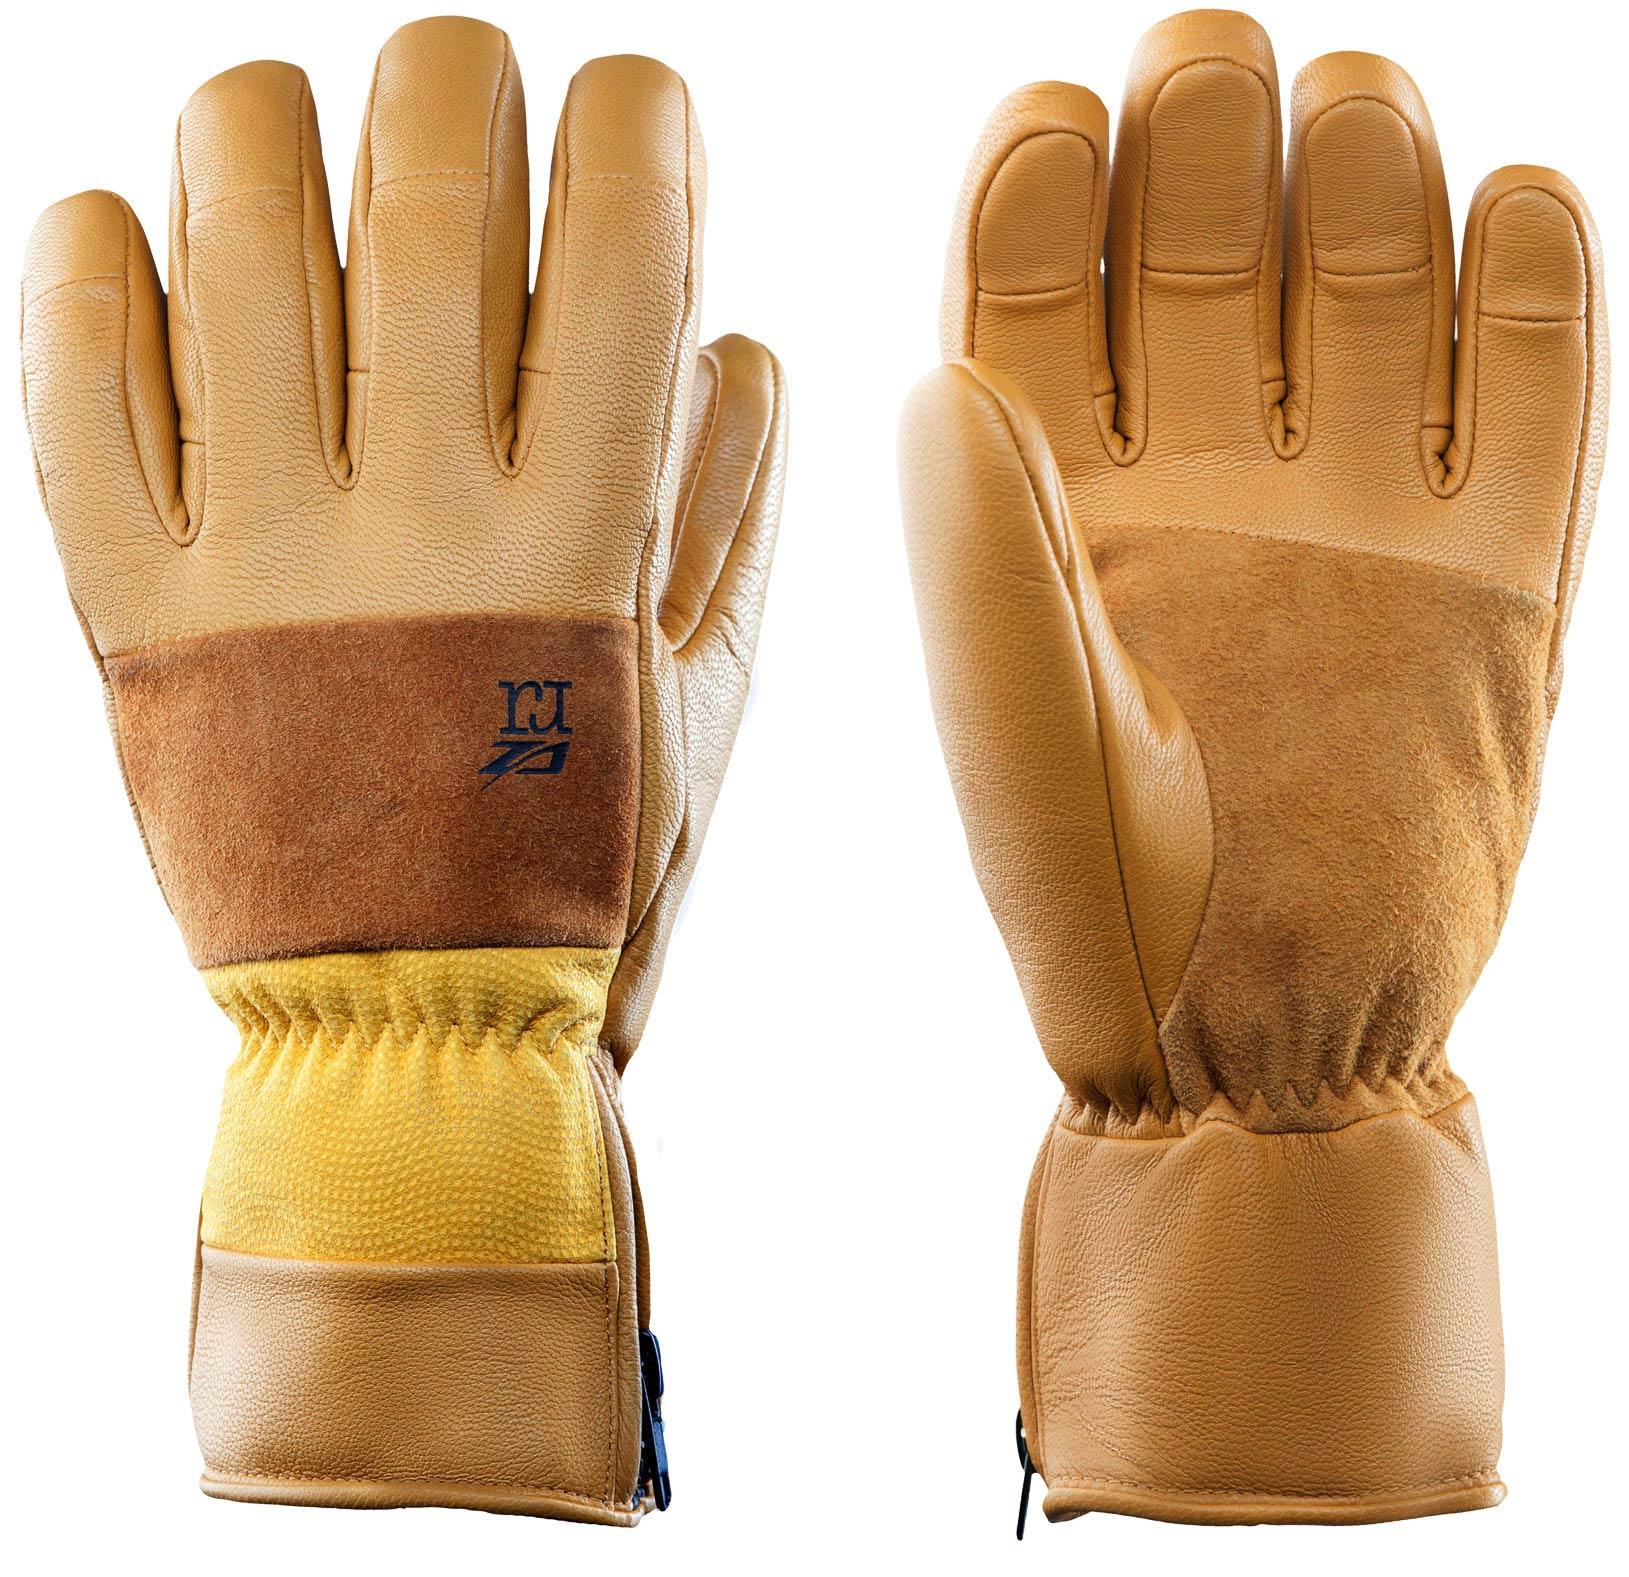 d08b0641d14c0d Zanier  Prestige Handschuhe 18 19